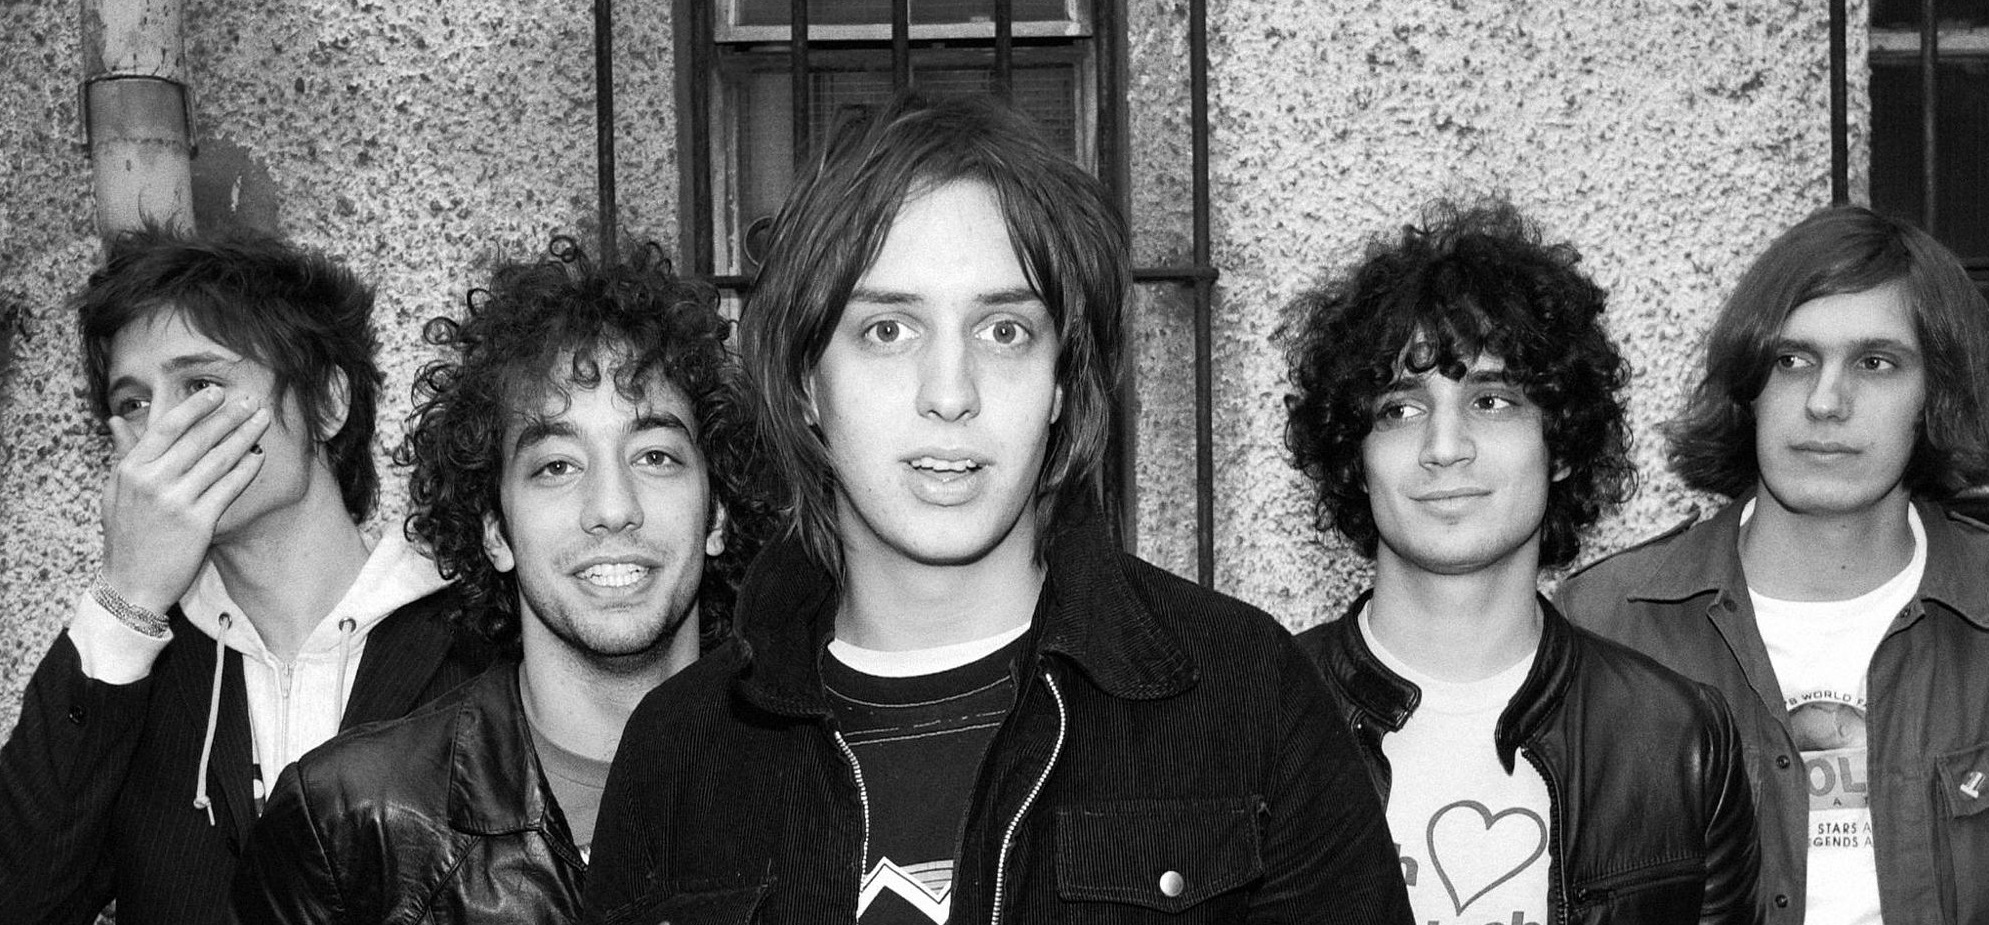 Is This It: el disco que reinició la historia del rock - Radio Cantilo